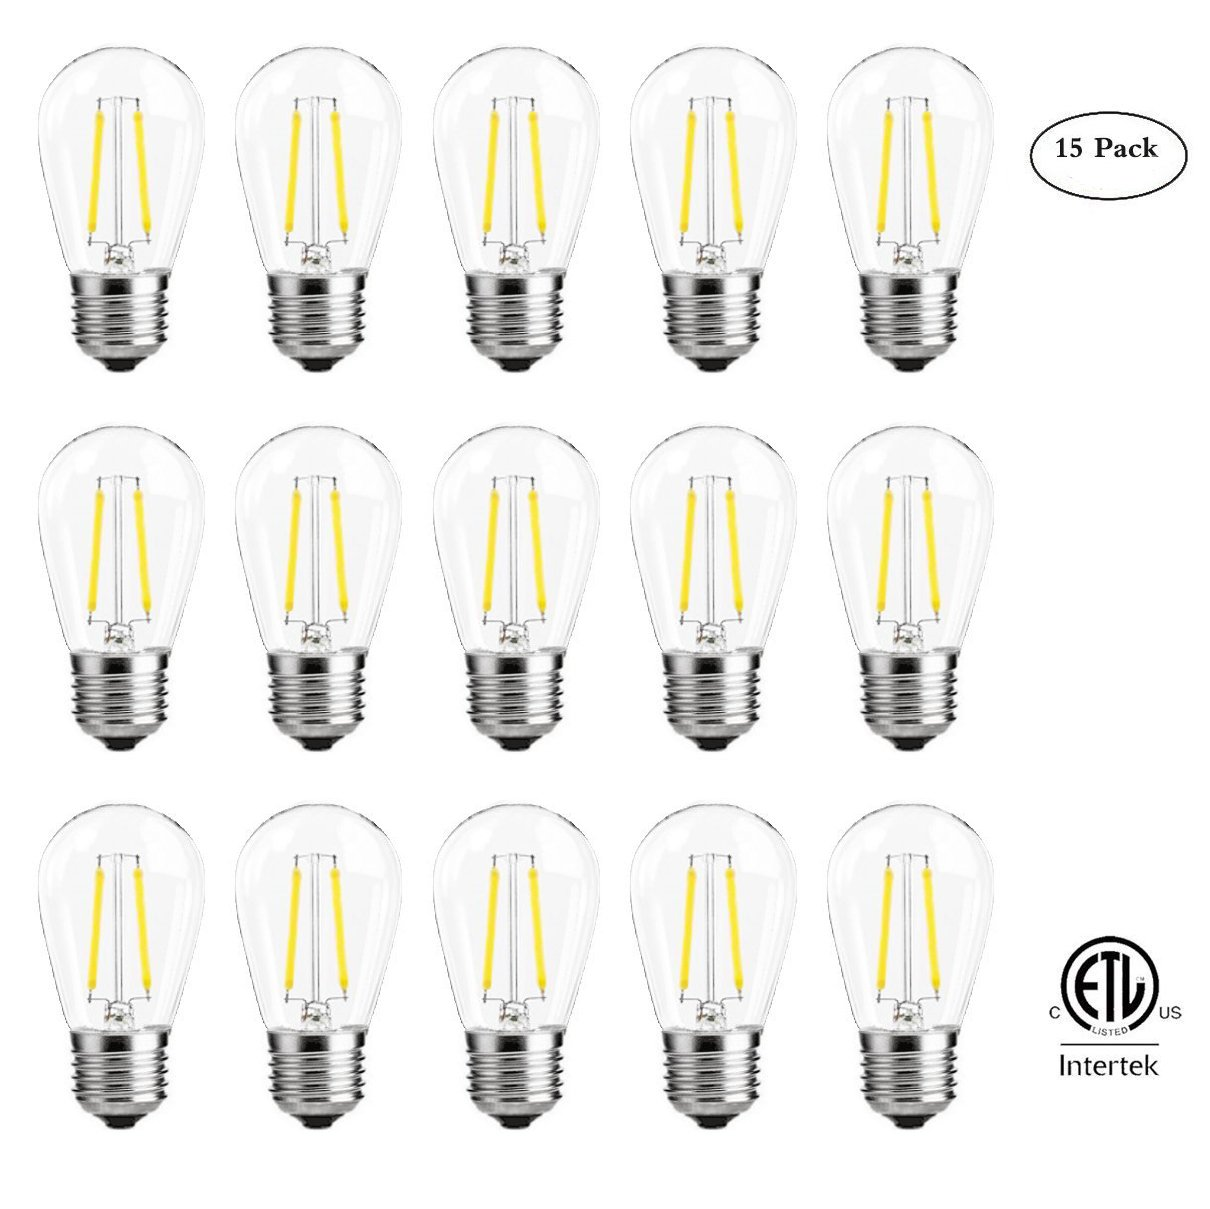 S14 LED Filament Bulbs 2W, Vintage Edison Led Light Bulbs,20Watt Incandescent Bulb Equivalent, 2700K (Warm White), 200 lumens, Great for String Lights, Commercial Lighting, Patio, Wedding, 15 Pack